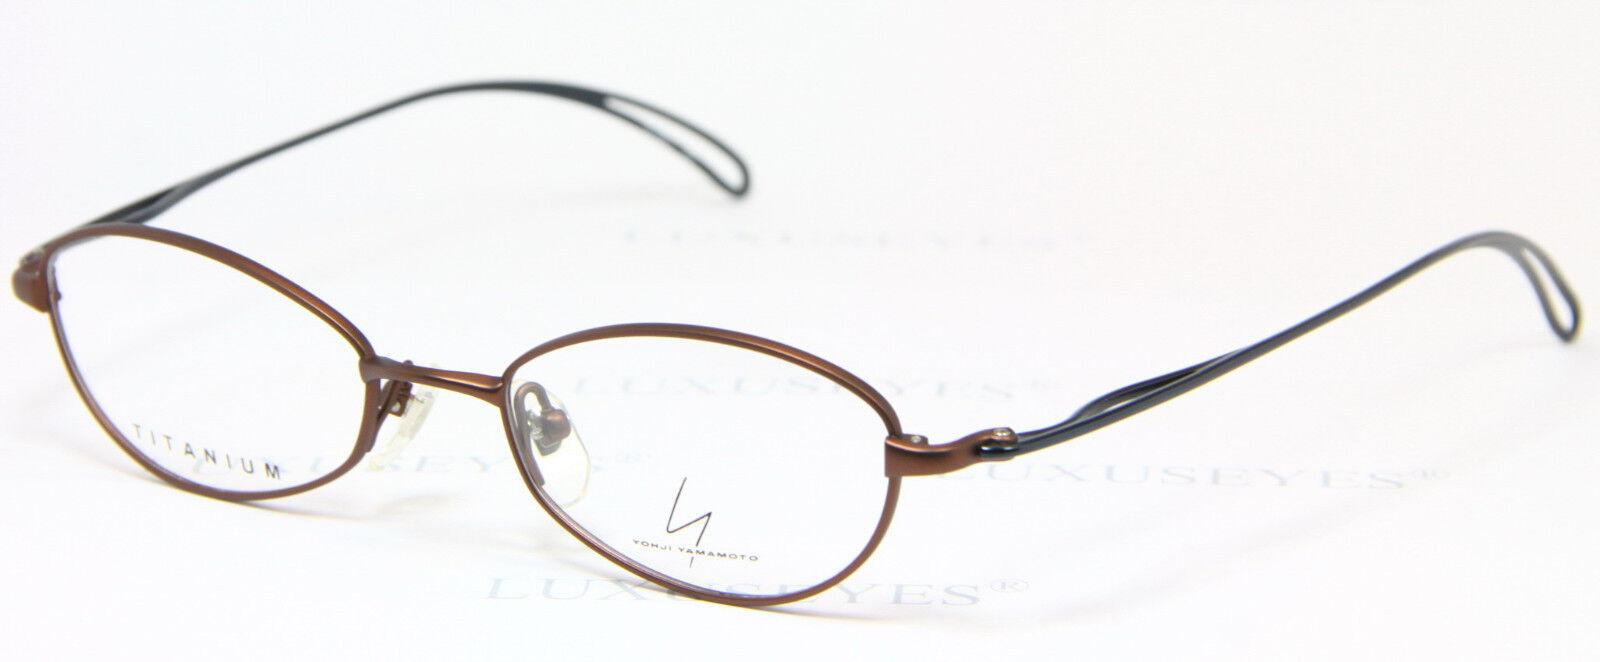 YOHJI YAMAMOTO 51-0011 Original Brille Eyeglasses Gafas TITANIUM Light Bril 2 1dHMPKjT3D